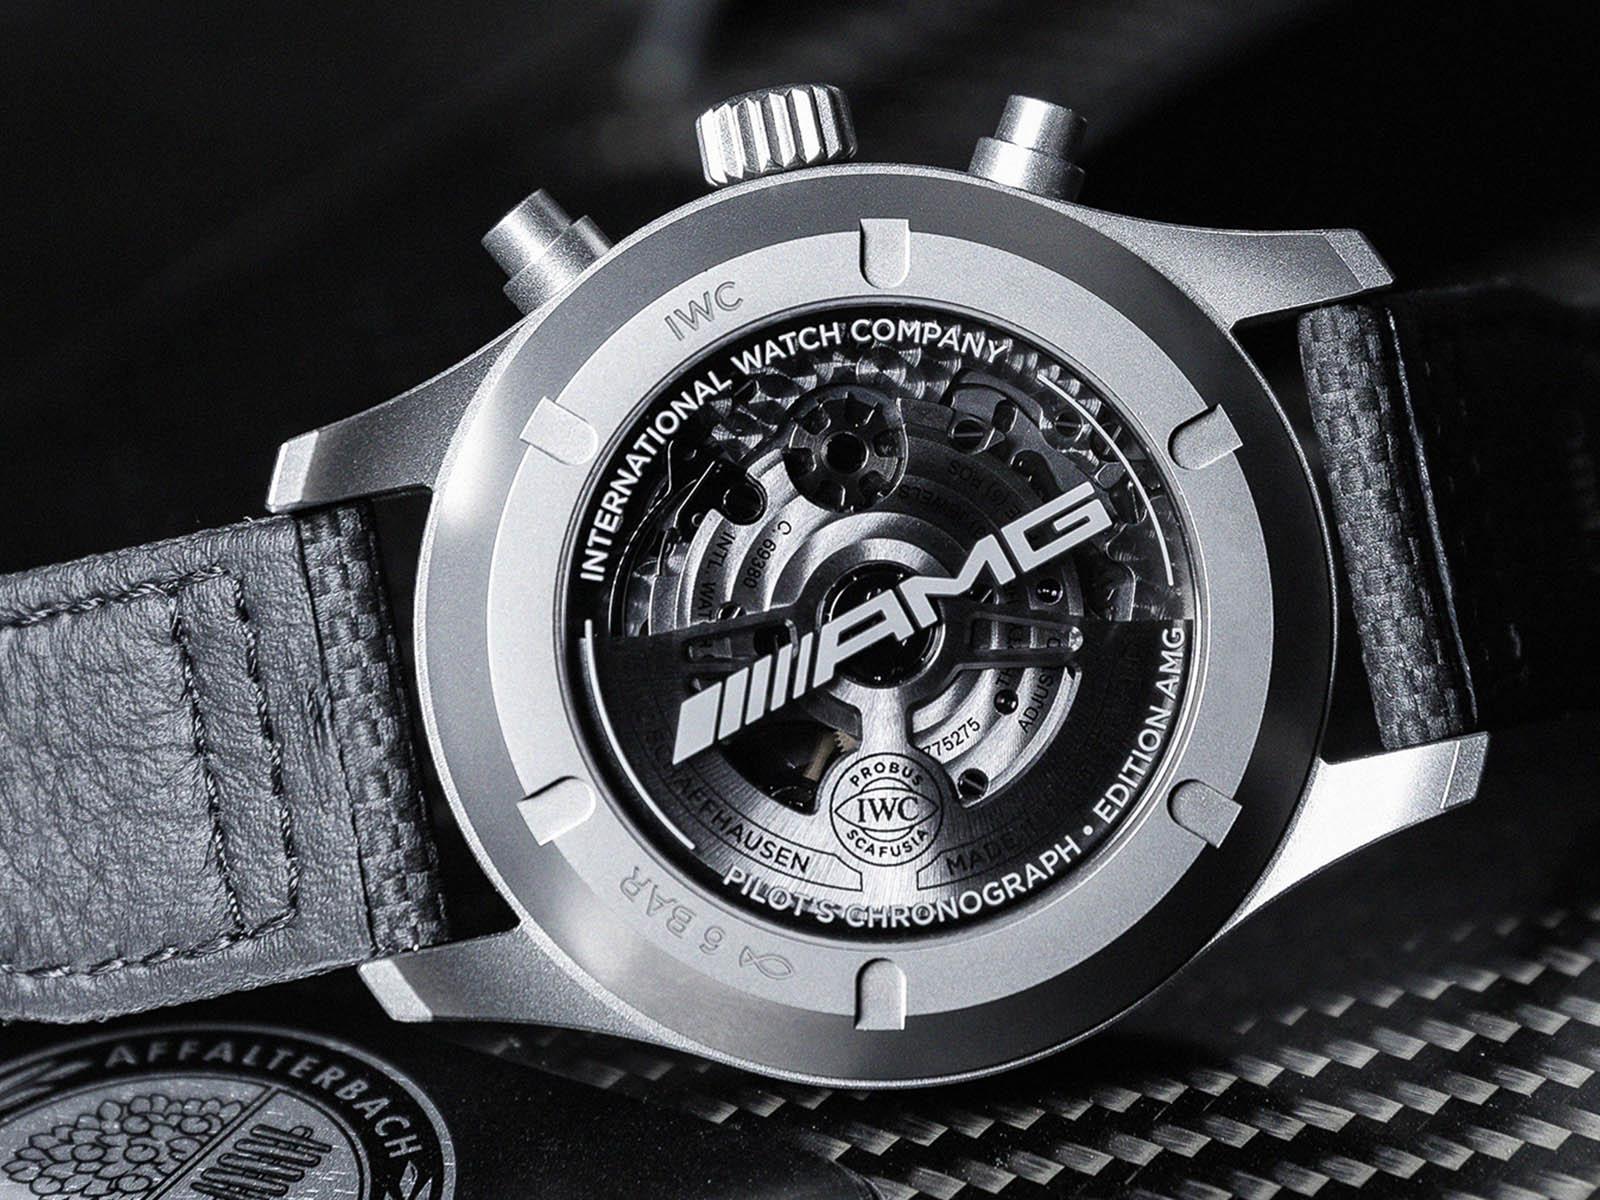 iw377903-iwc-pilot-s-watch-chronograph-edition-amg-5.jpg